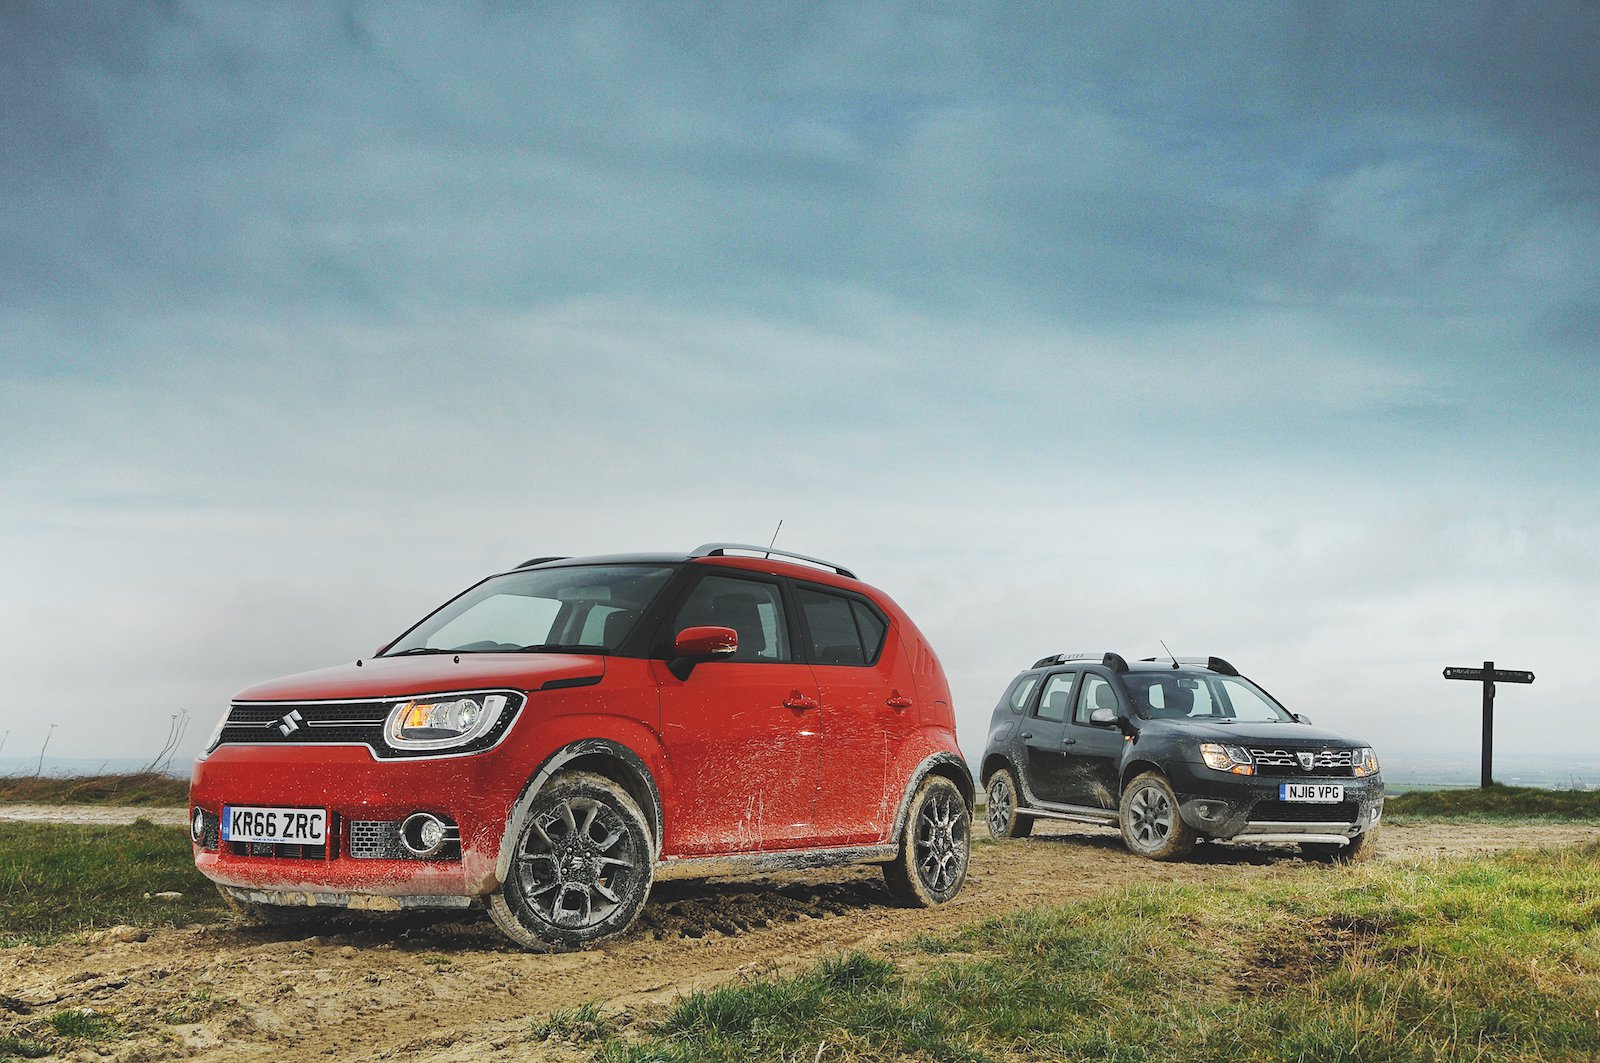 Used test: Dacia Duster vs Suzuki Ignis